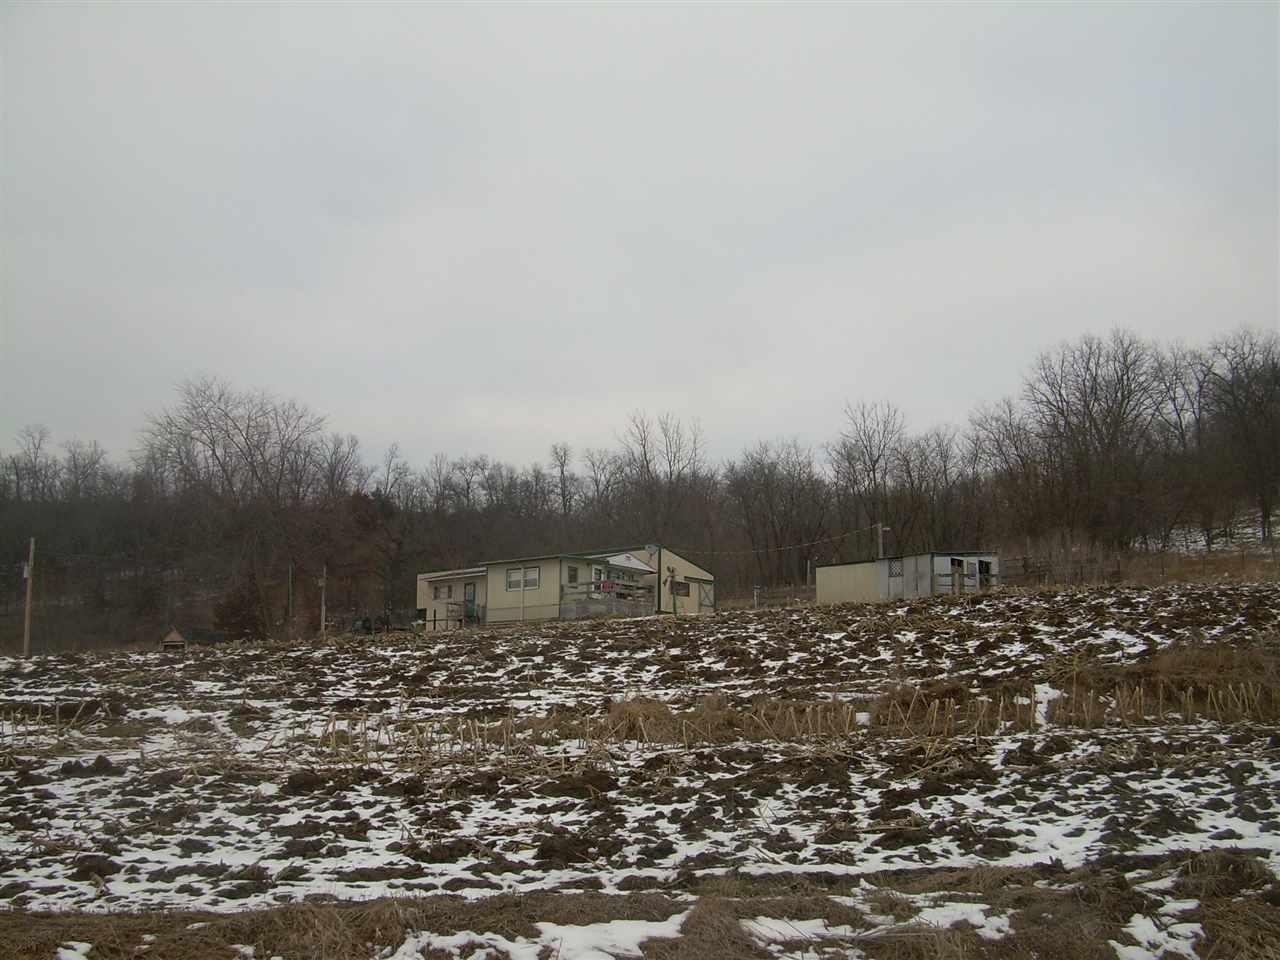 211 Suttle Creek Rd, Monona, IA 52159